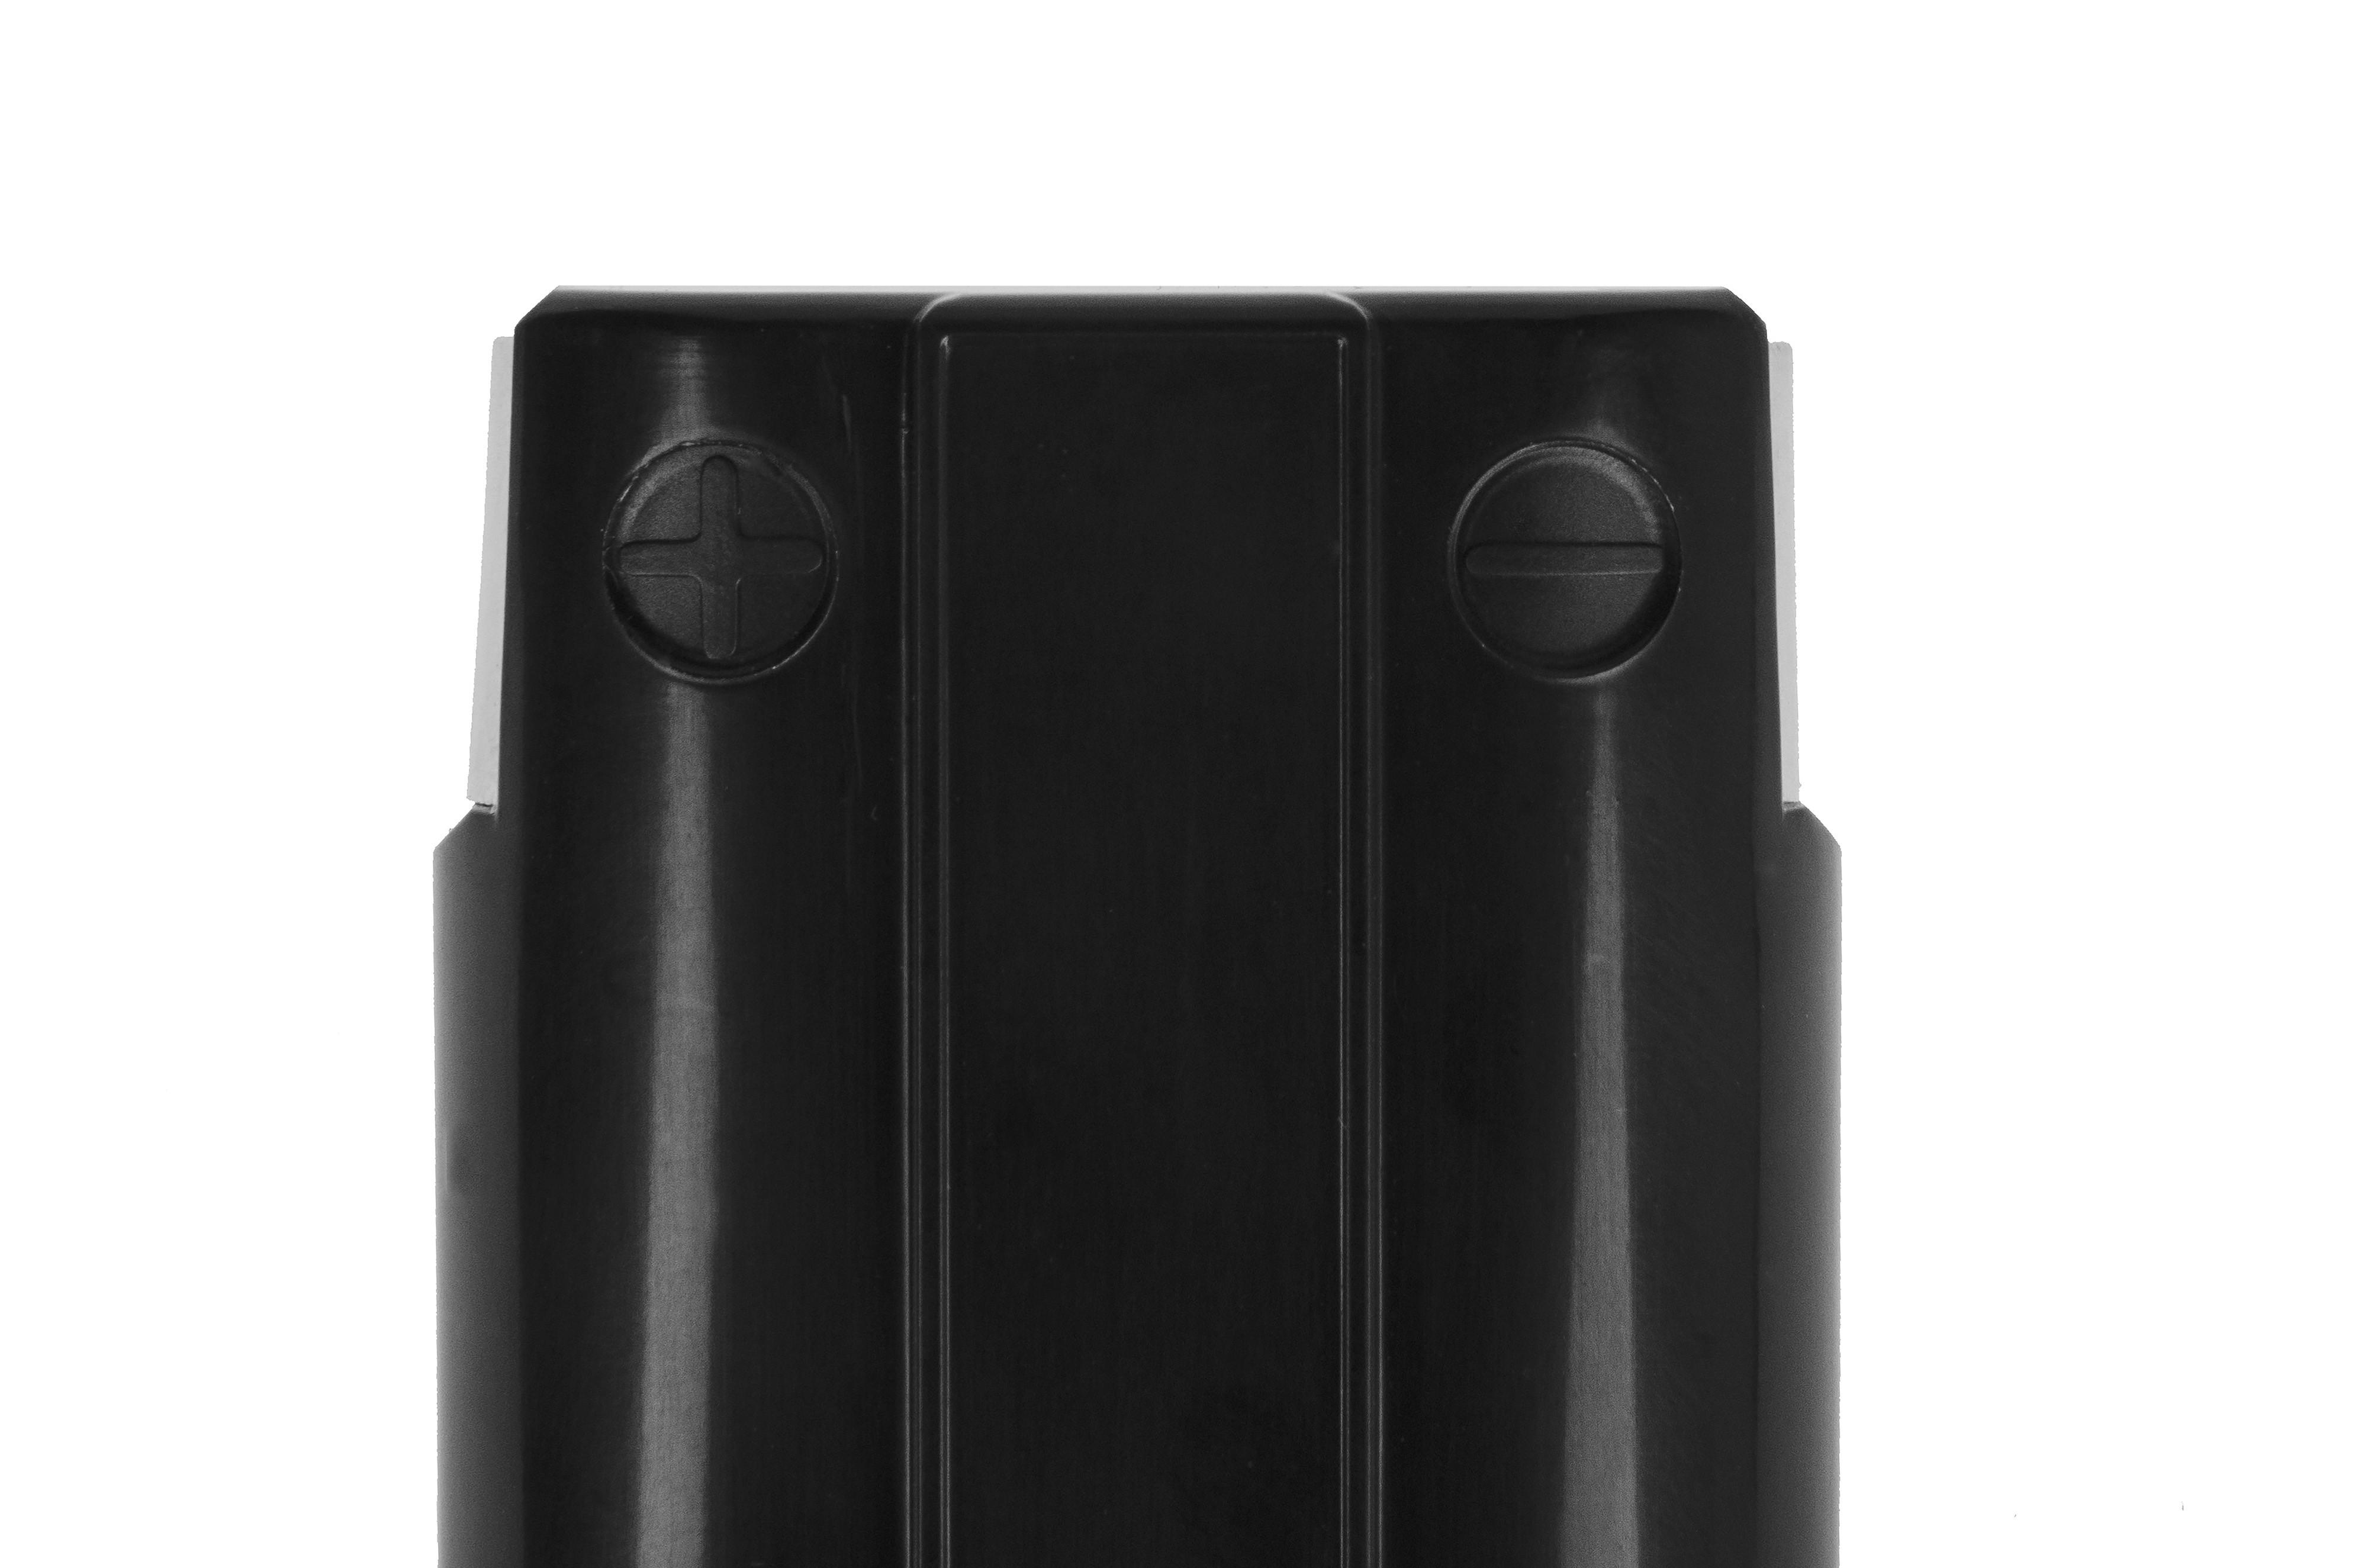 Baterie Green Cell Paslode 404400 404717 Paslode IMCT IM50 IM65 IM200 IM250 IM300 IM325 IM350 | 6V 2100mAh Ni-MH – neoriginální